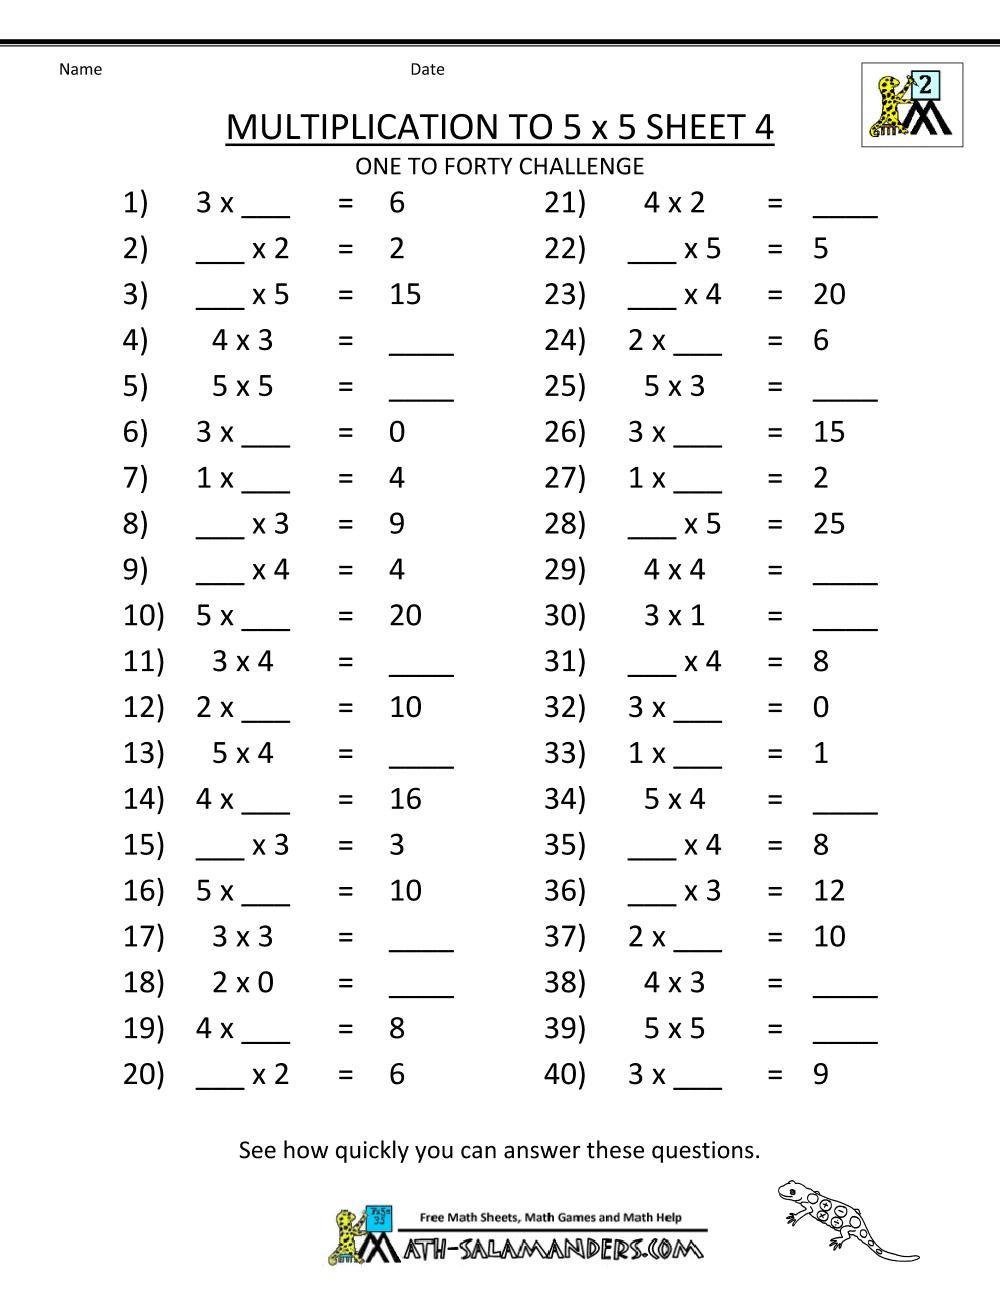 Multiplication Worksheets Grade 3 Coloring | 3Rd Grade Math intended for Printable Multiplication Sheets For Grade 3